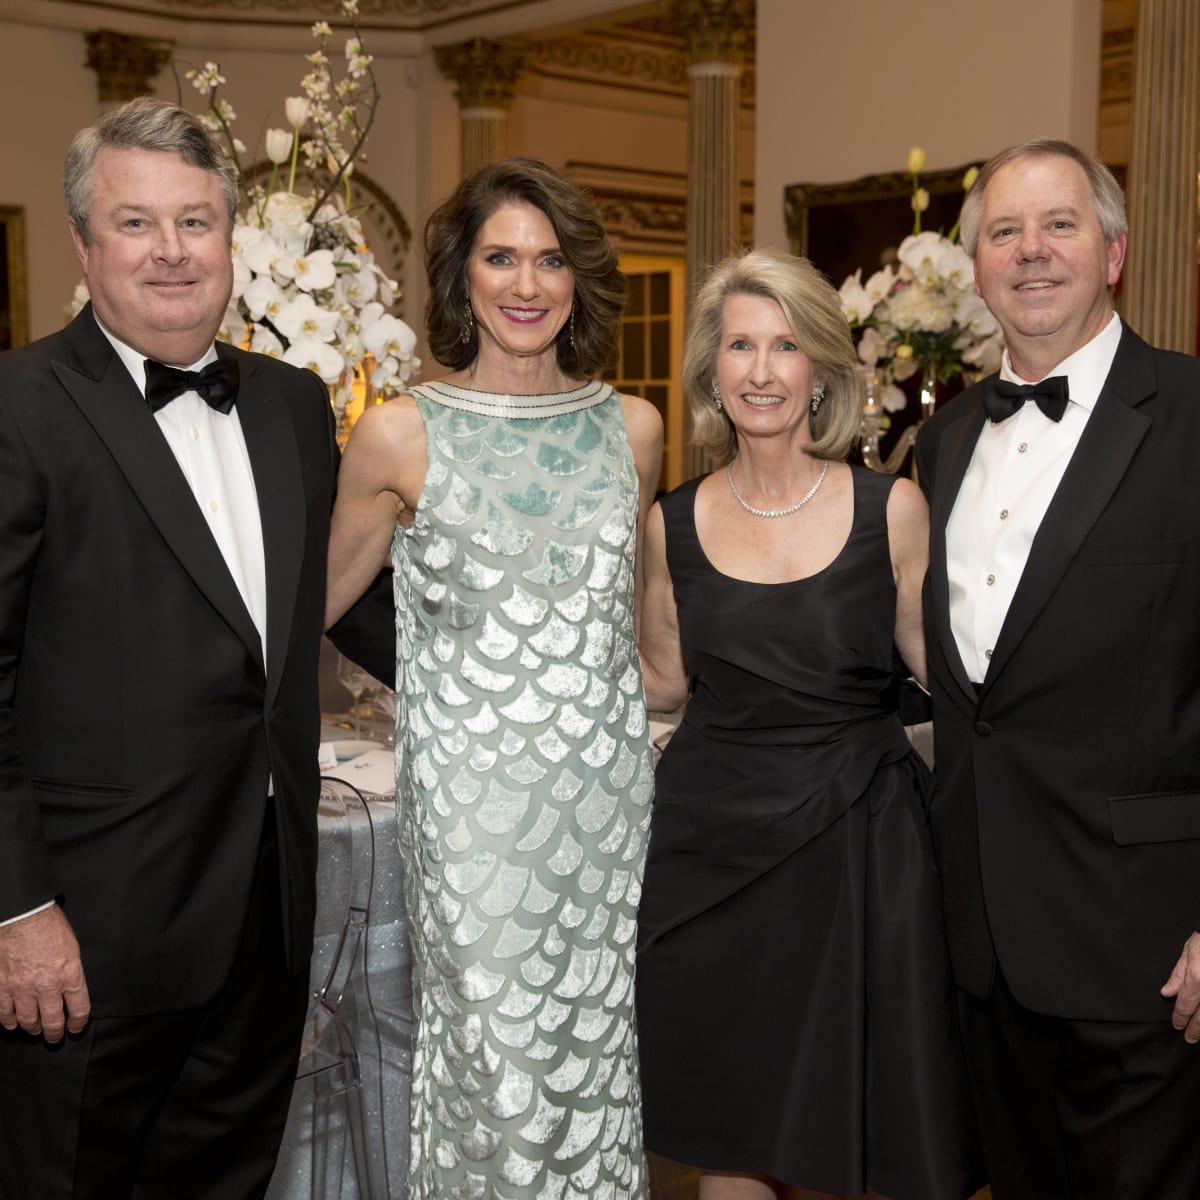 Rienzi society dinner, Feb. 2016, Luke and Christiana McConn; Marilyn and Christopher Winters